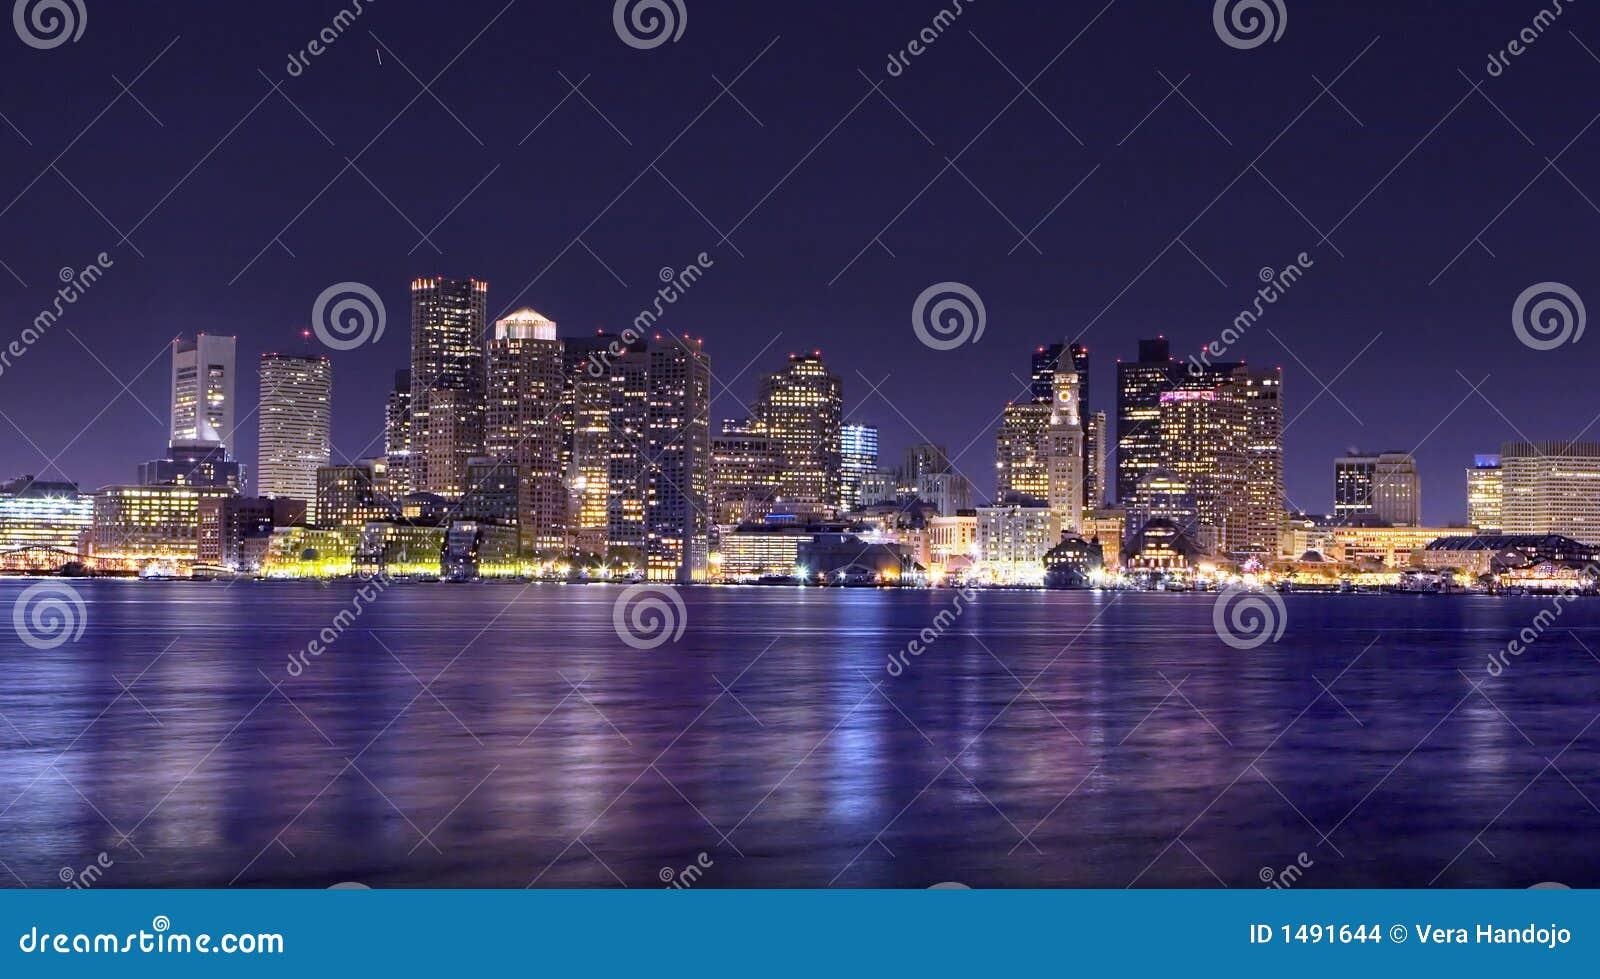 Panorama de la noche de Boston